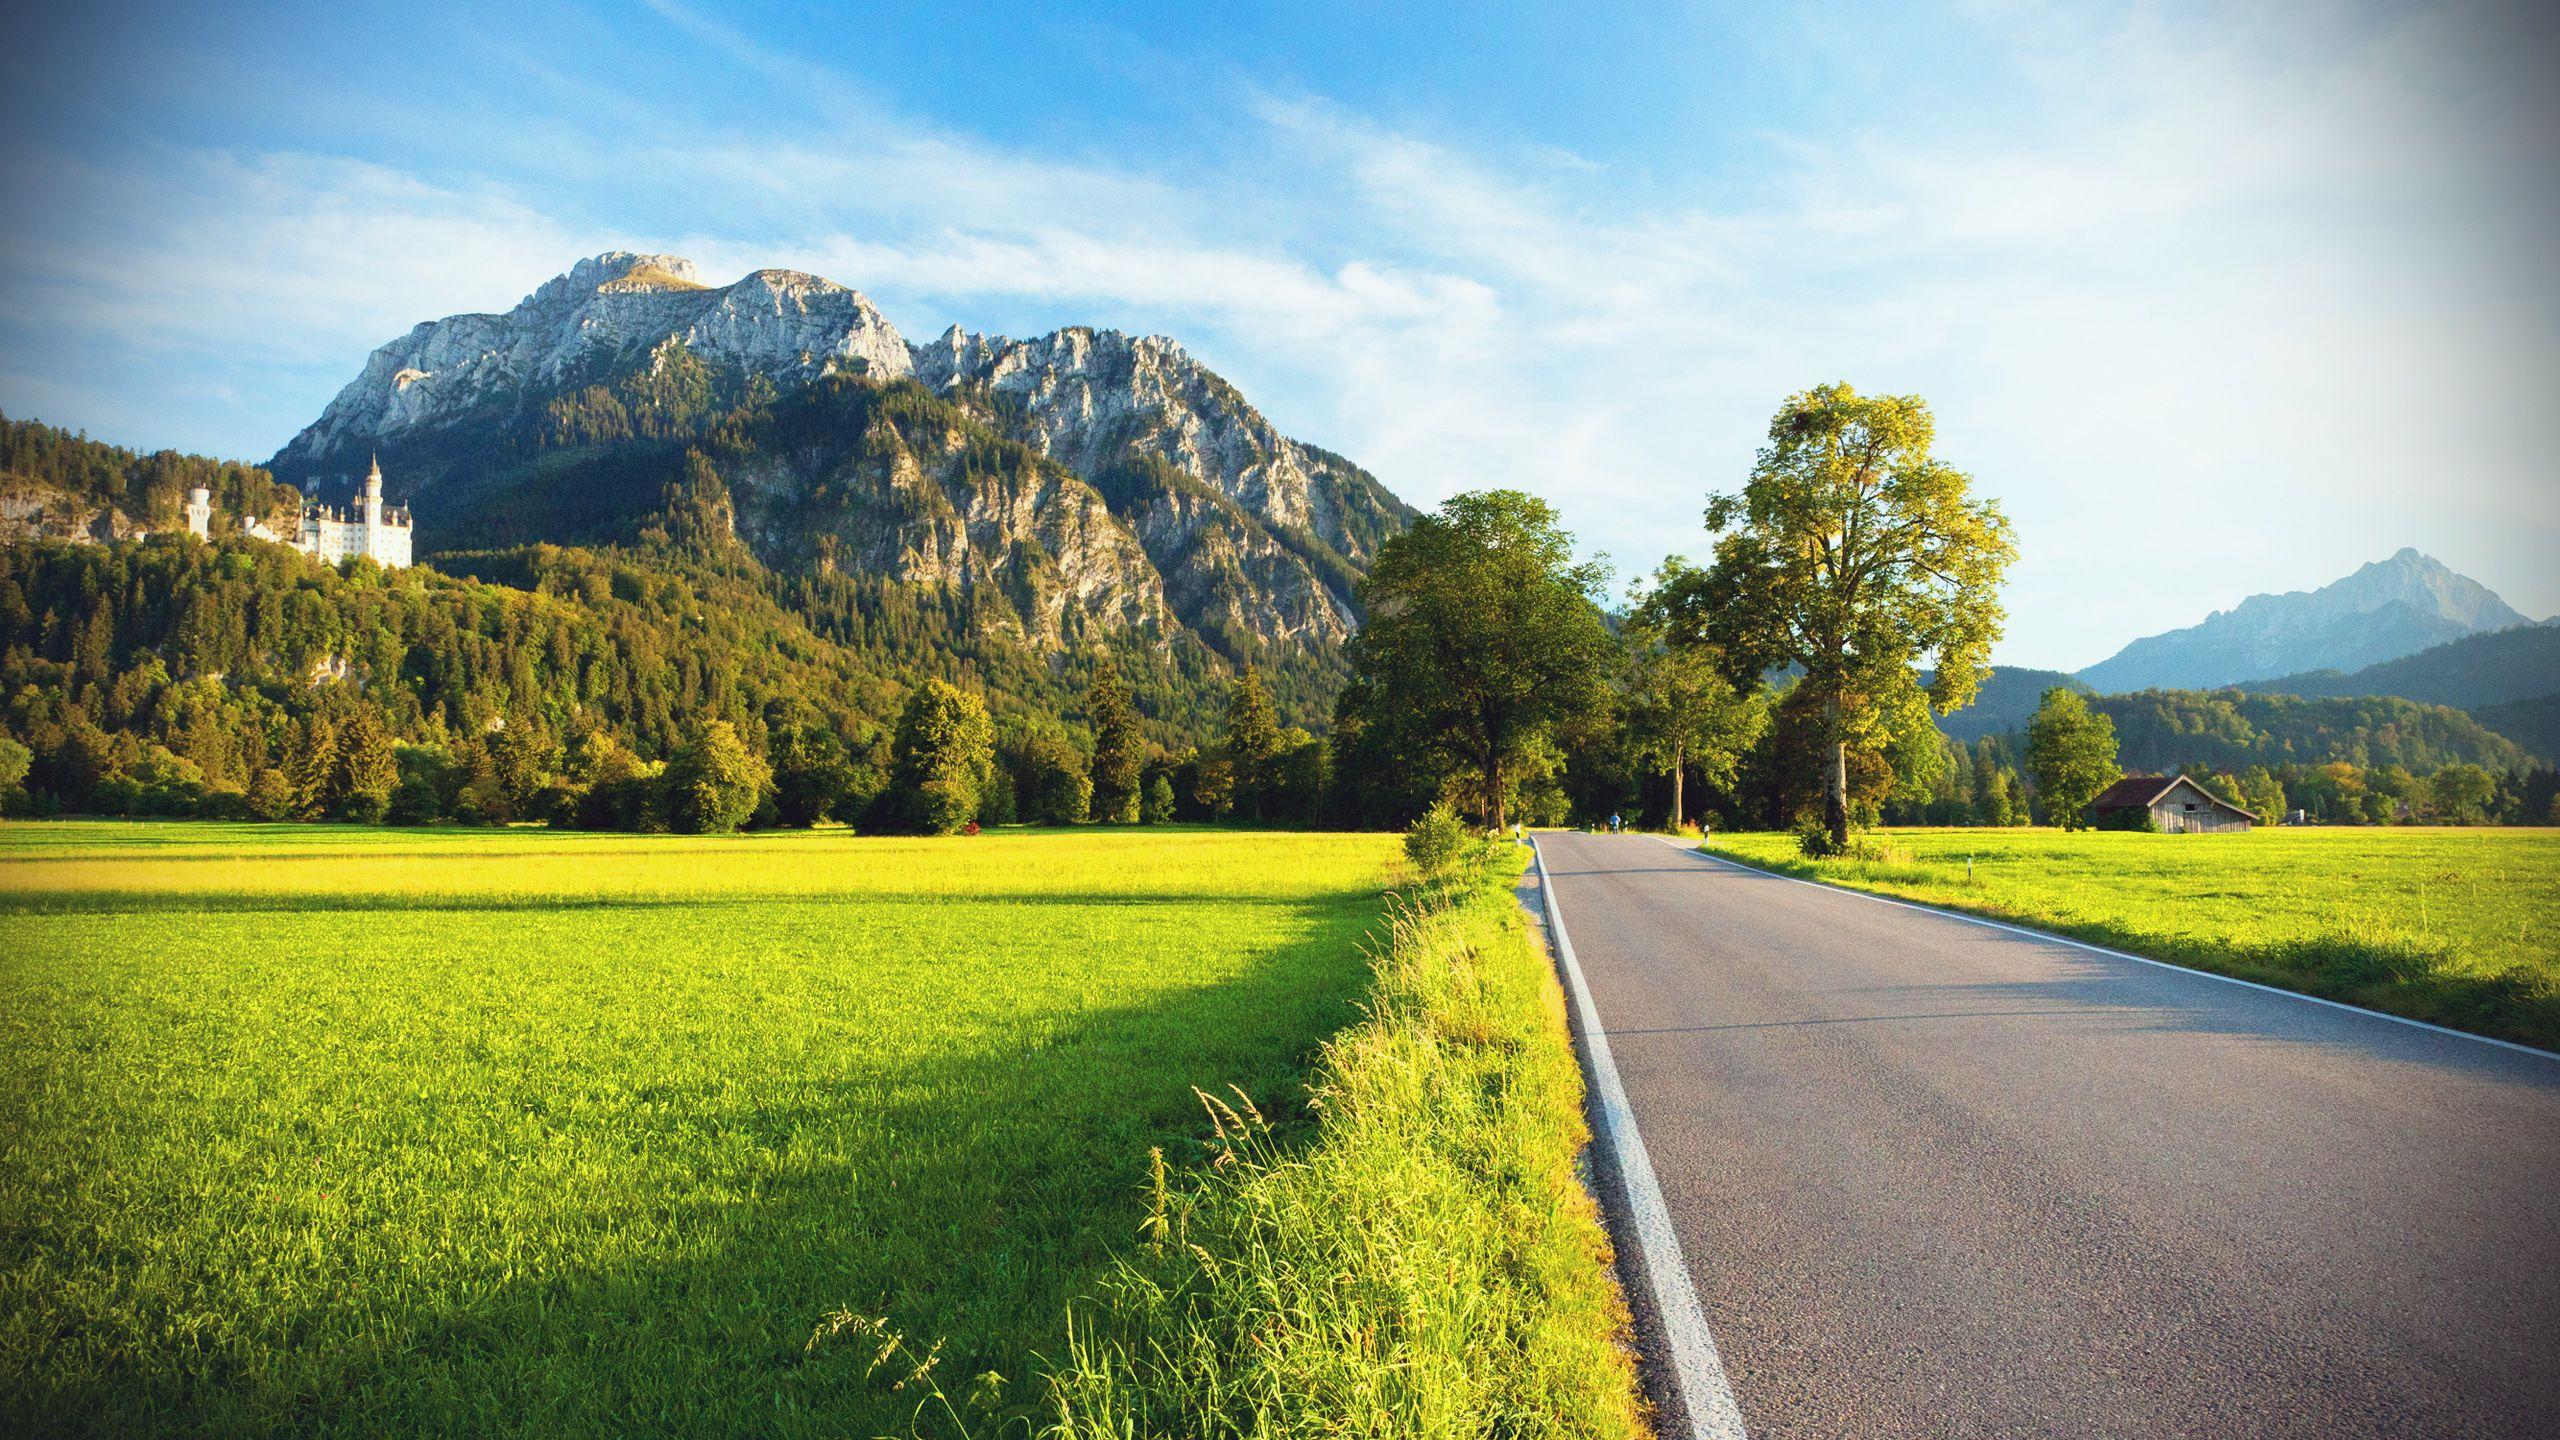 View Hd Wallpaper 2560x1440 27516 Beautiful Landscape Wallpaper Scenery Wallpaper Landscape Wallpaper